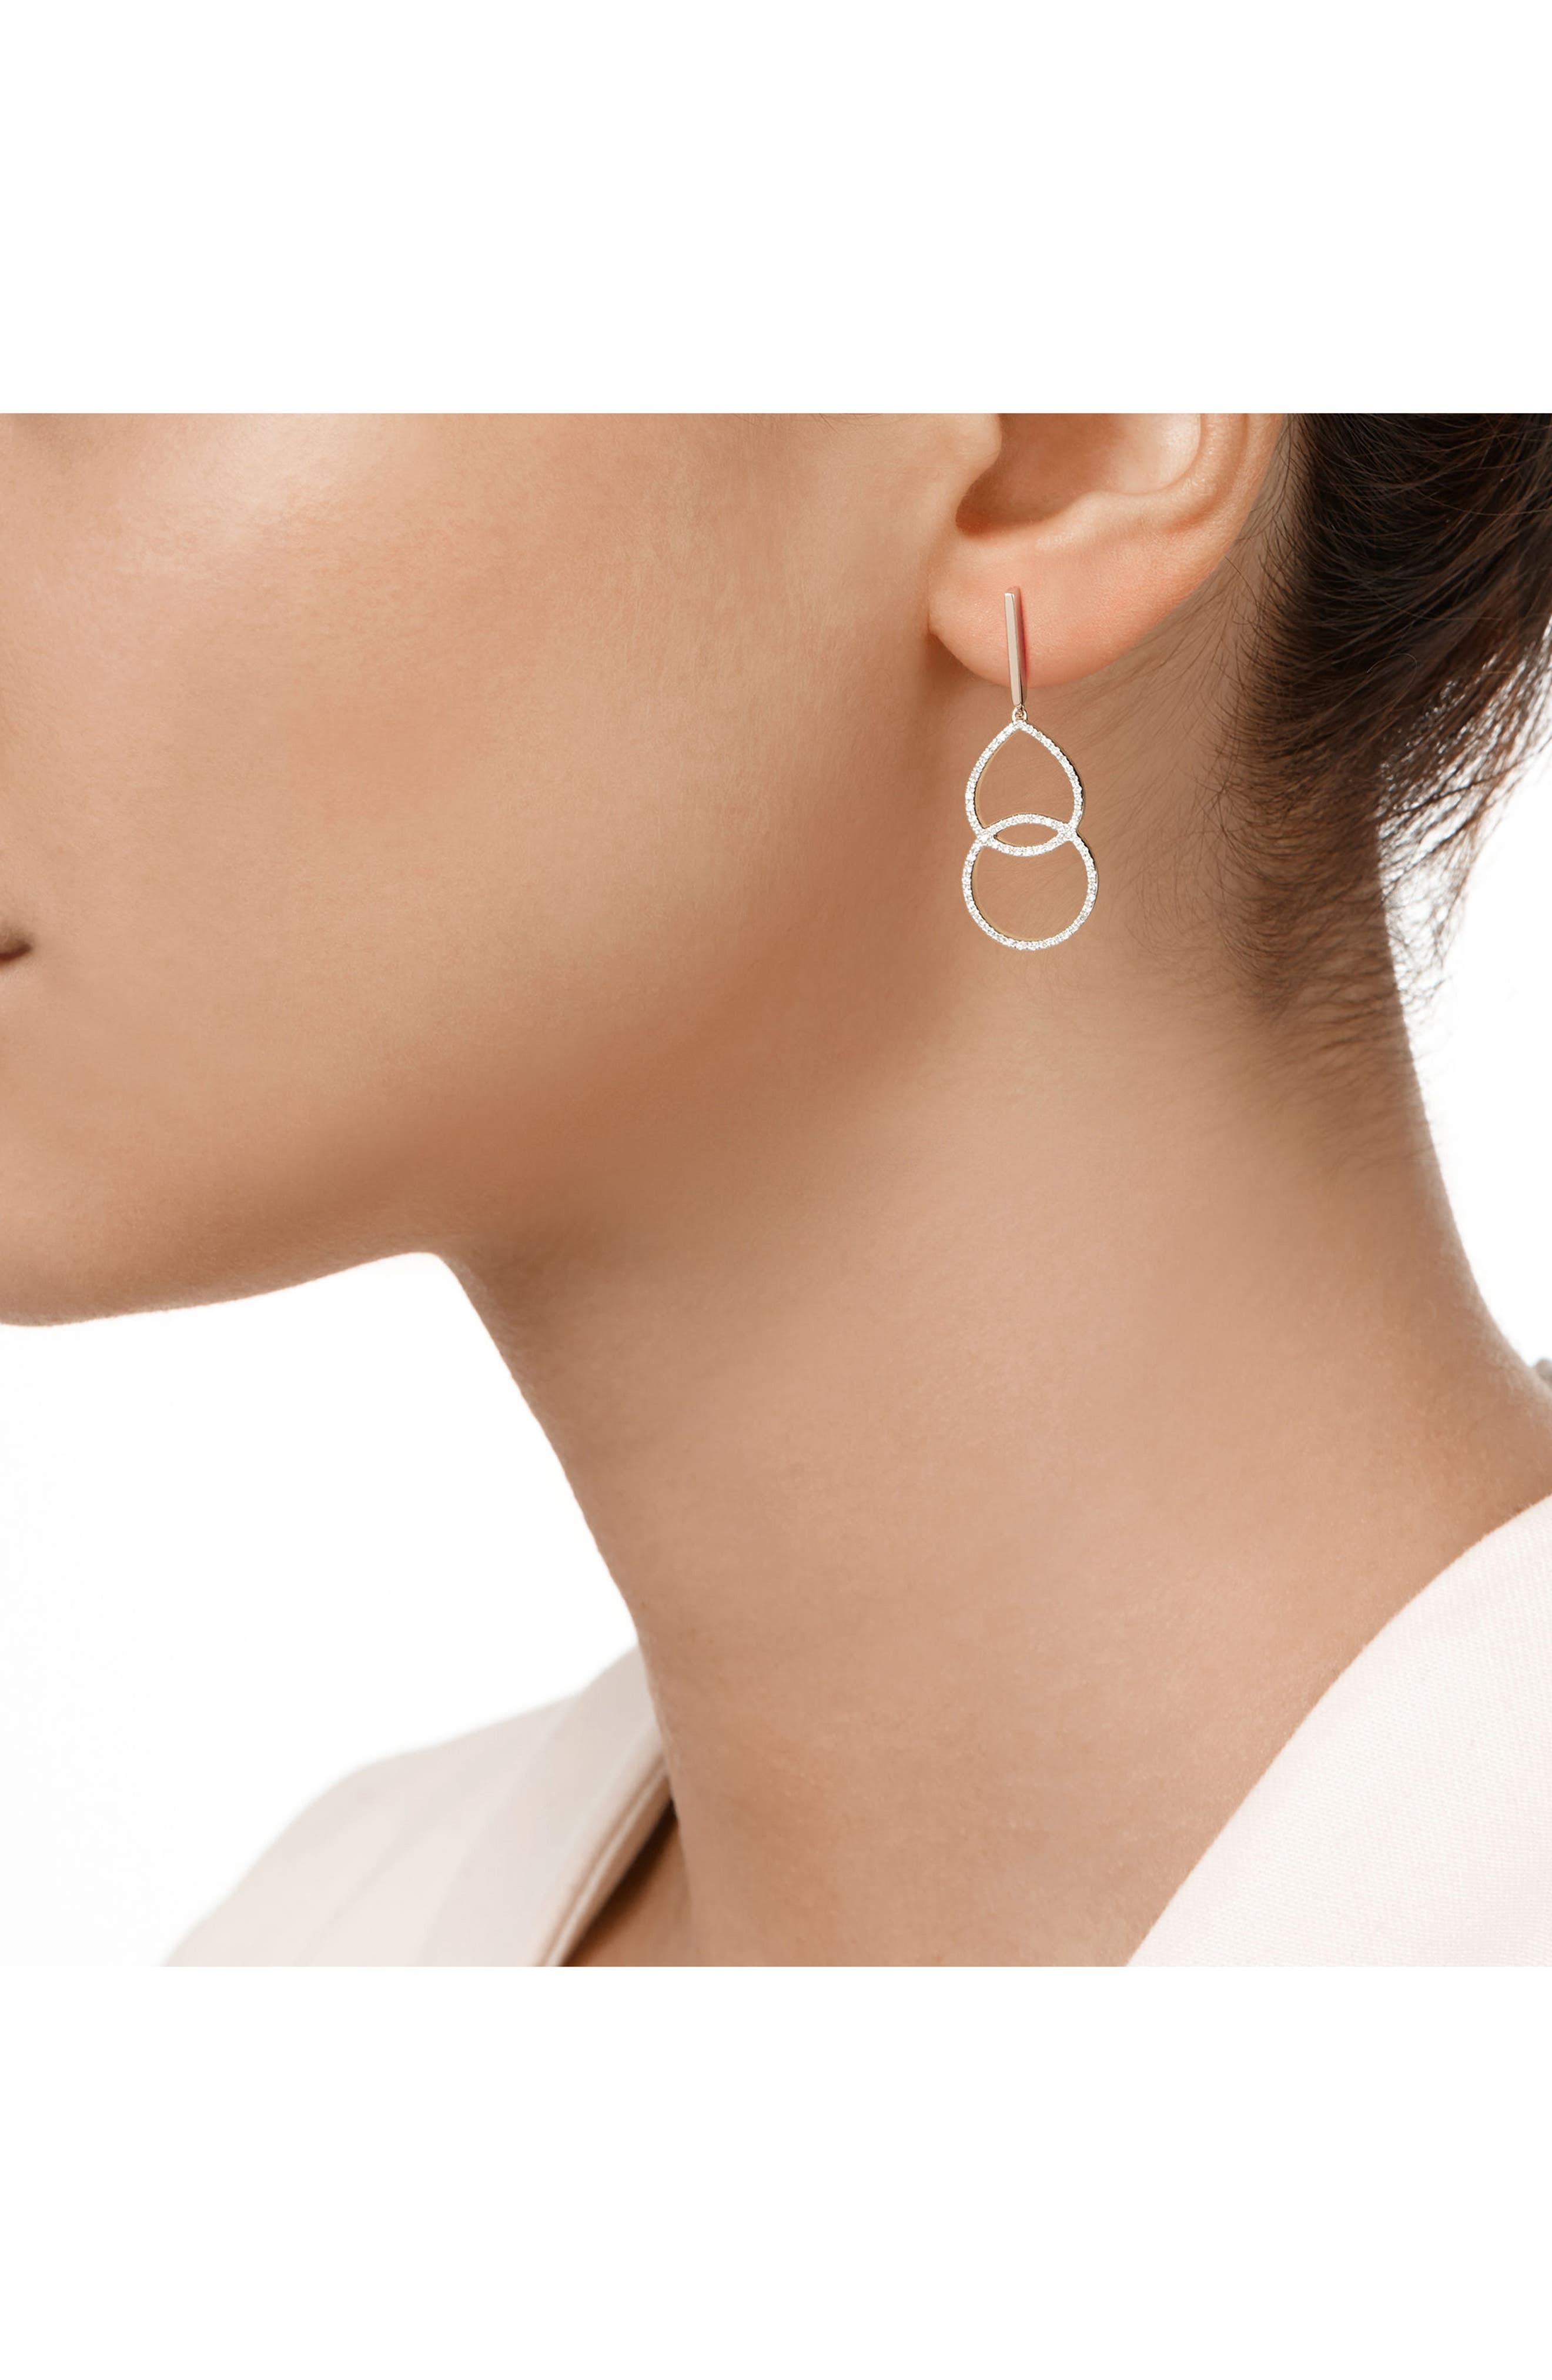 Naida Diamond Kiss Drop Earrings,                             Alternate thumbnail 3, color,                             650